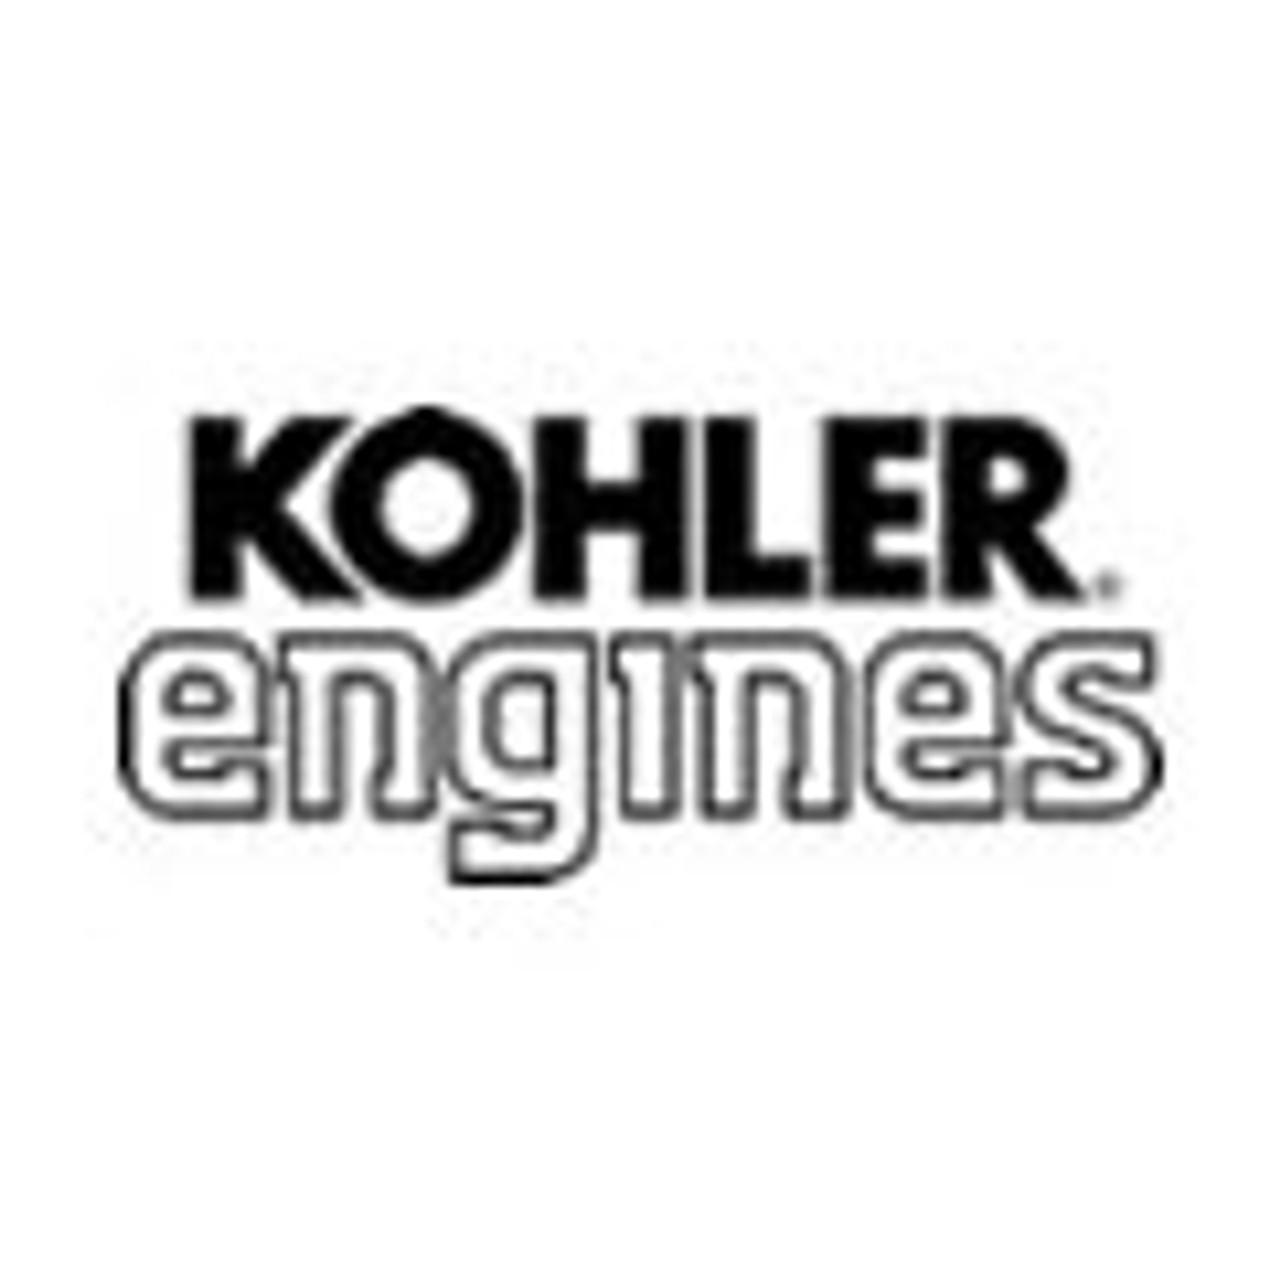 Kohler Engine Parts - Genuine Kohler Replacement Parts | SEPW